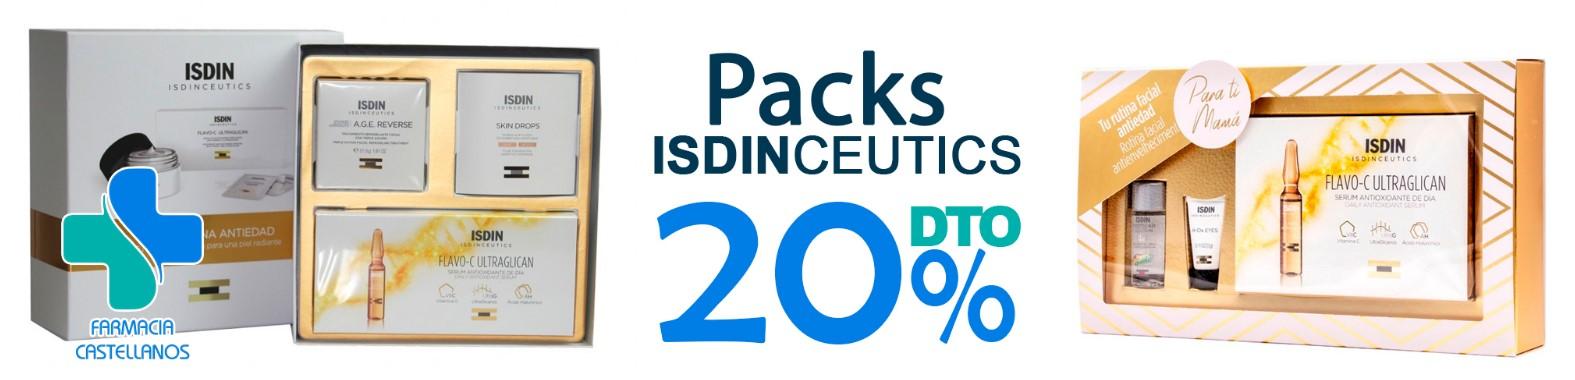 farmaciabeatrizcastellanos-packs-isdinceutics